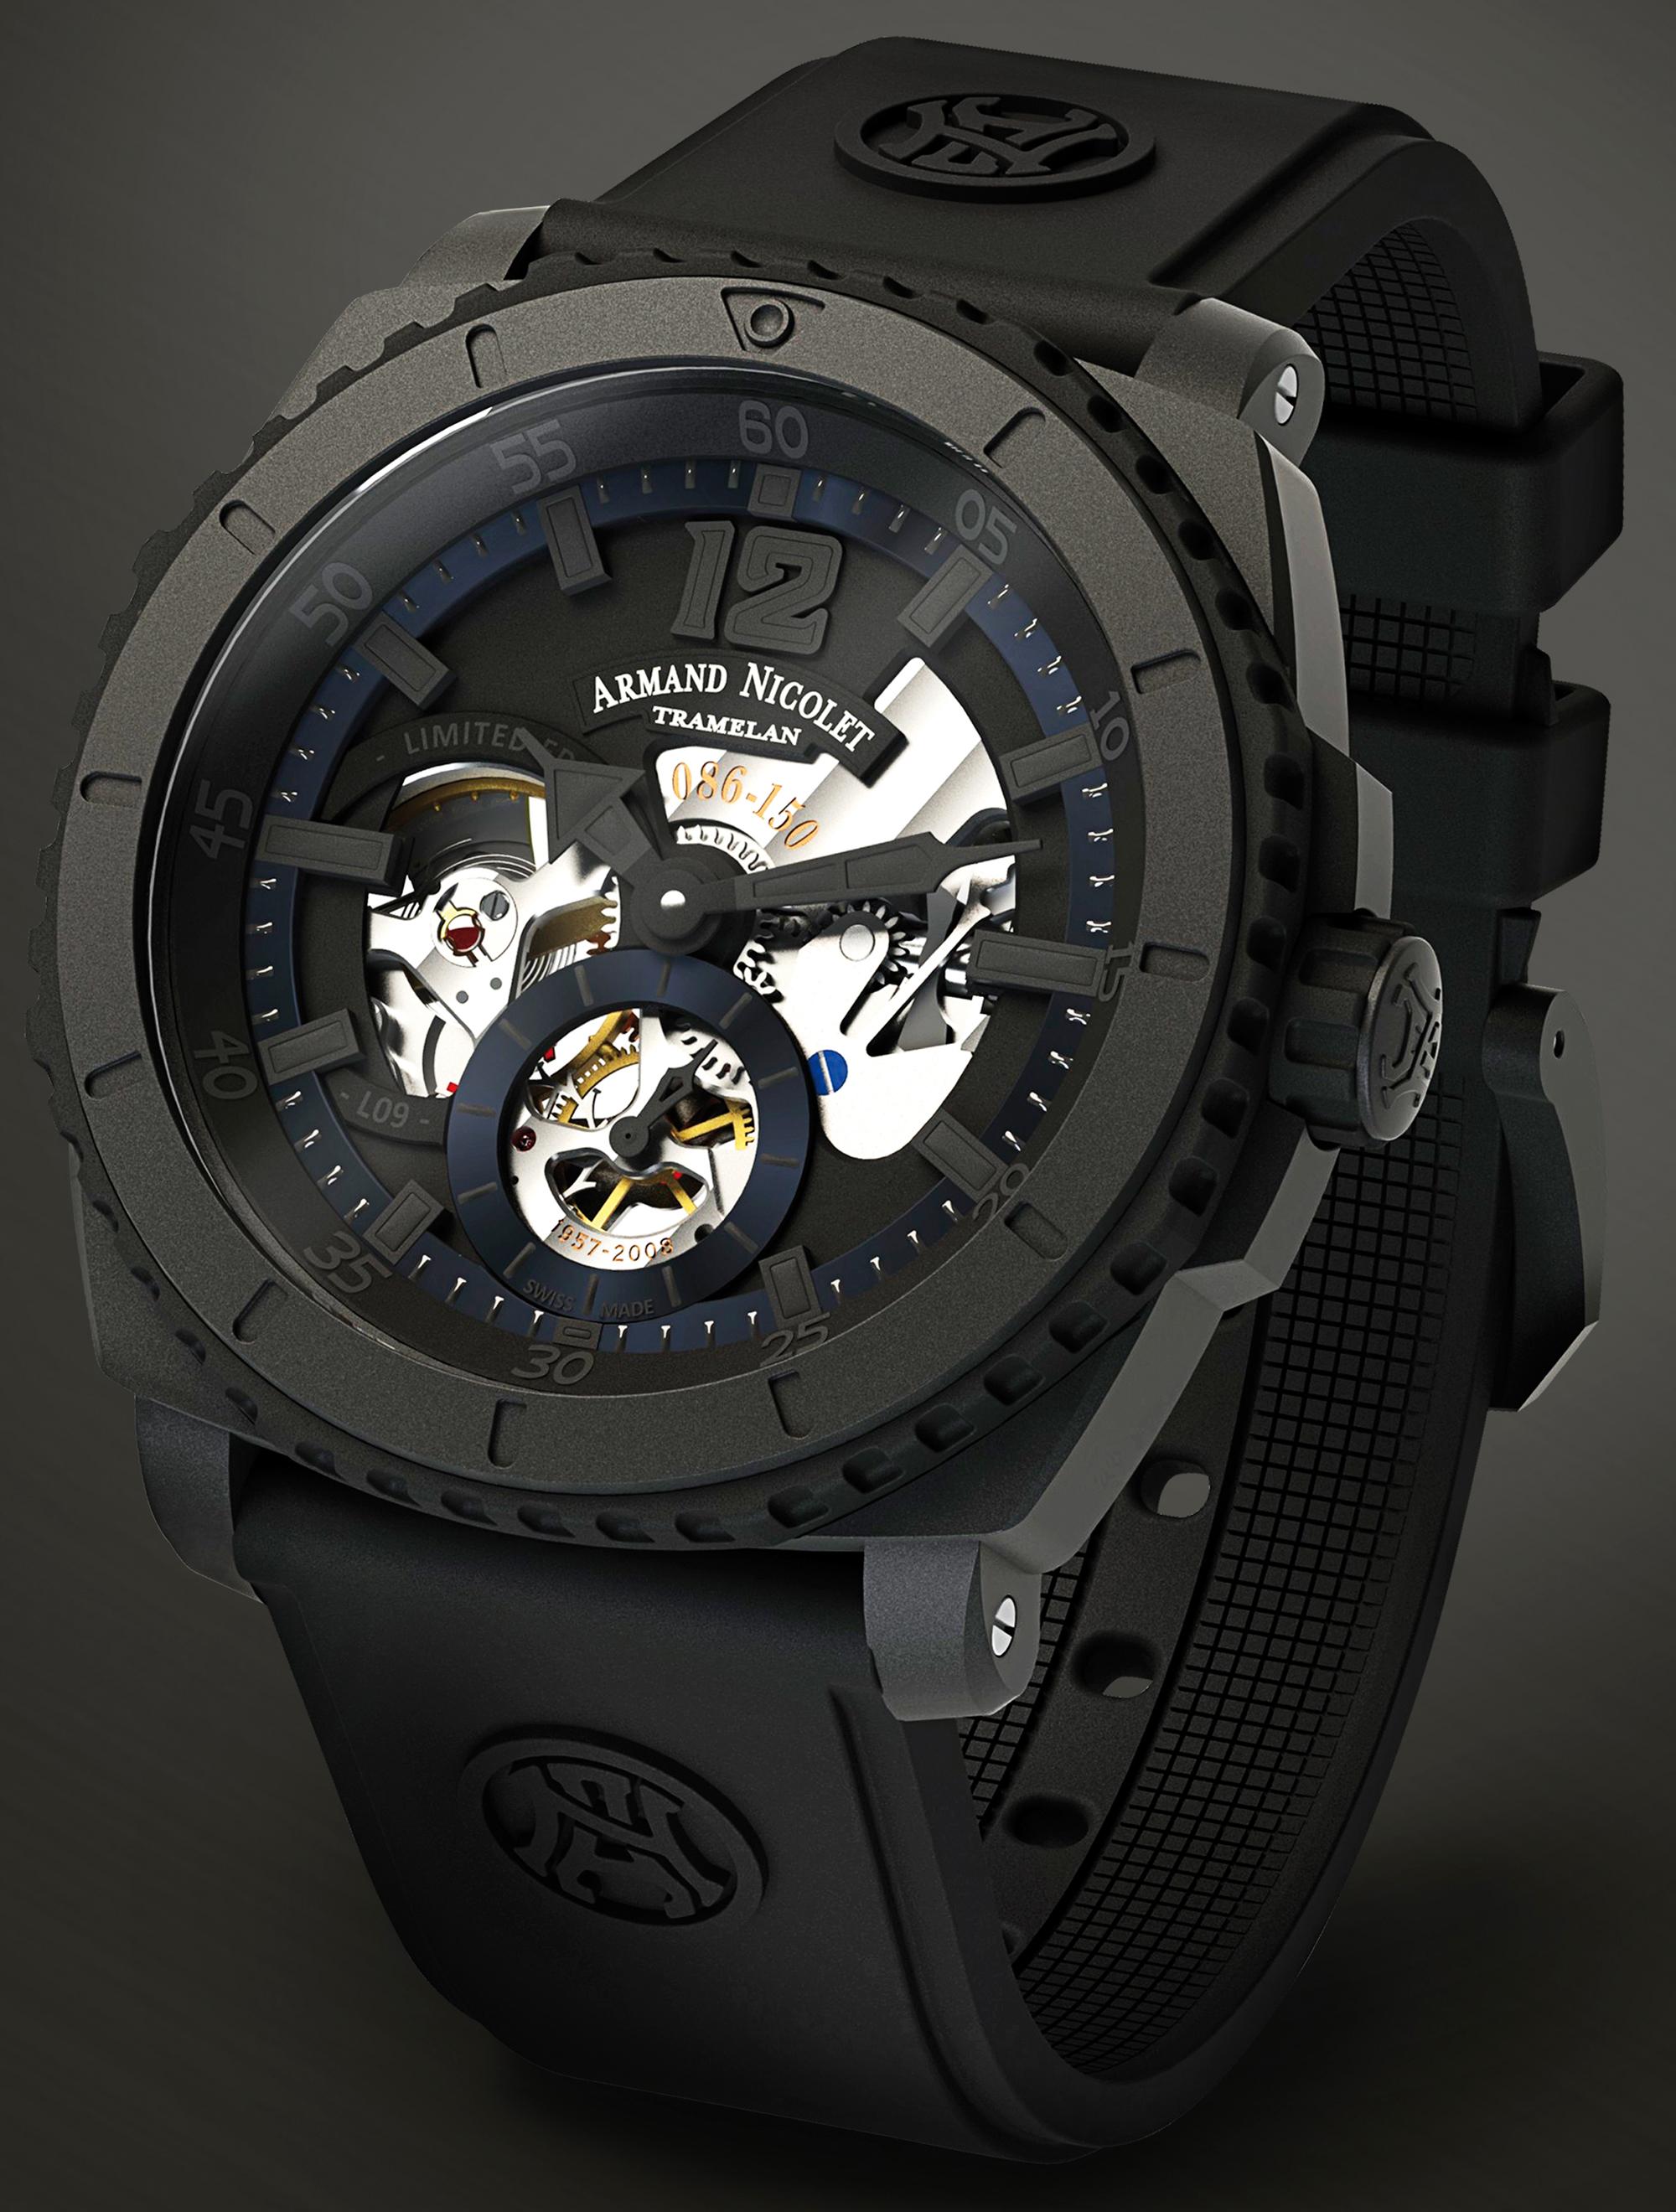 Коллекция спортивных часов L09 от Armand Nicolet на BaselWorld 2012